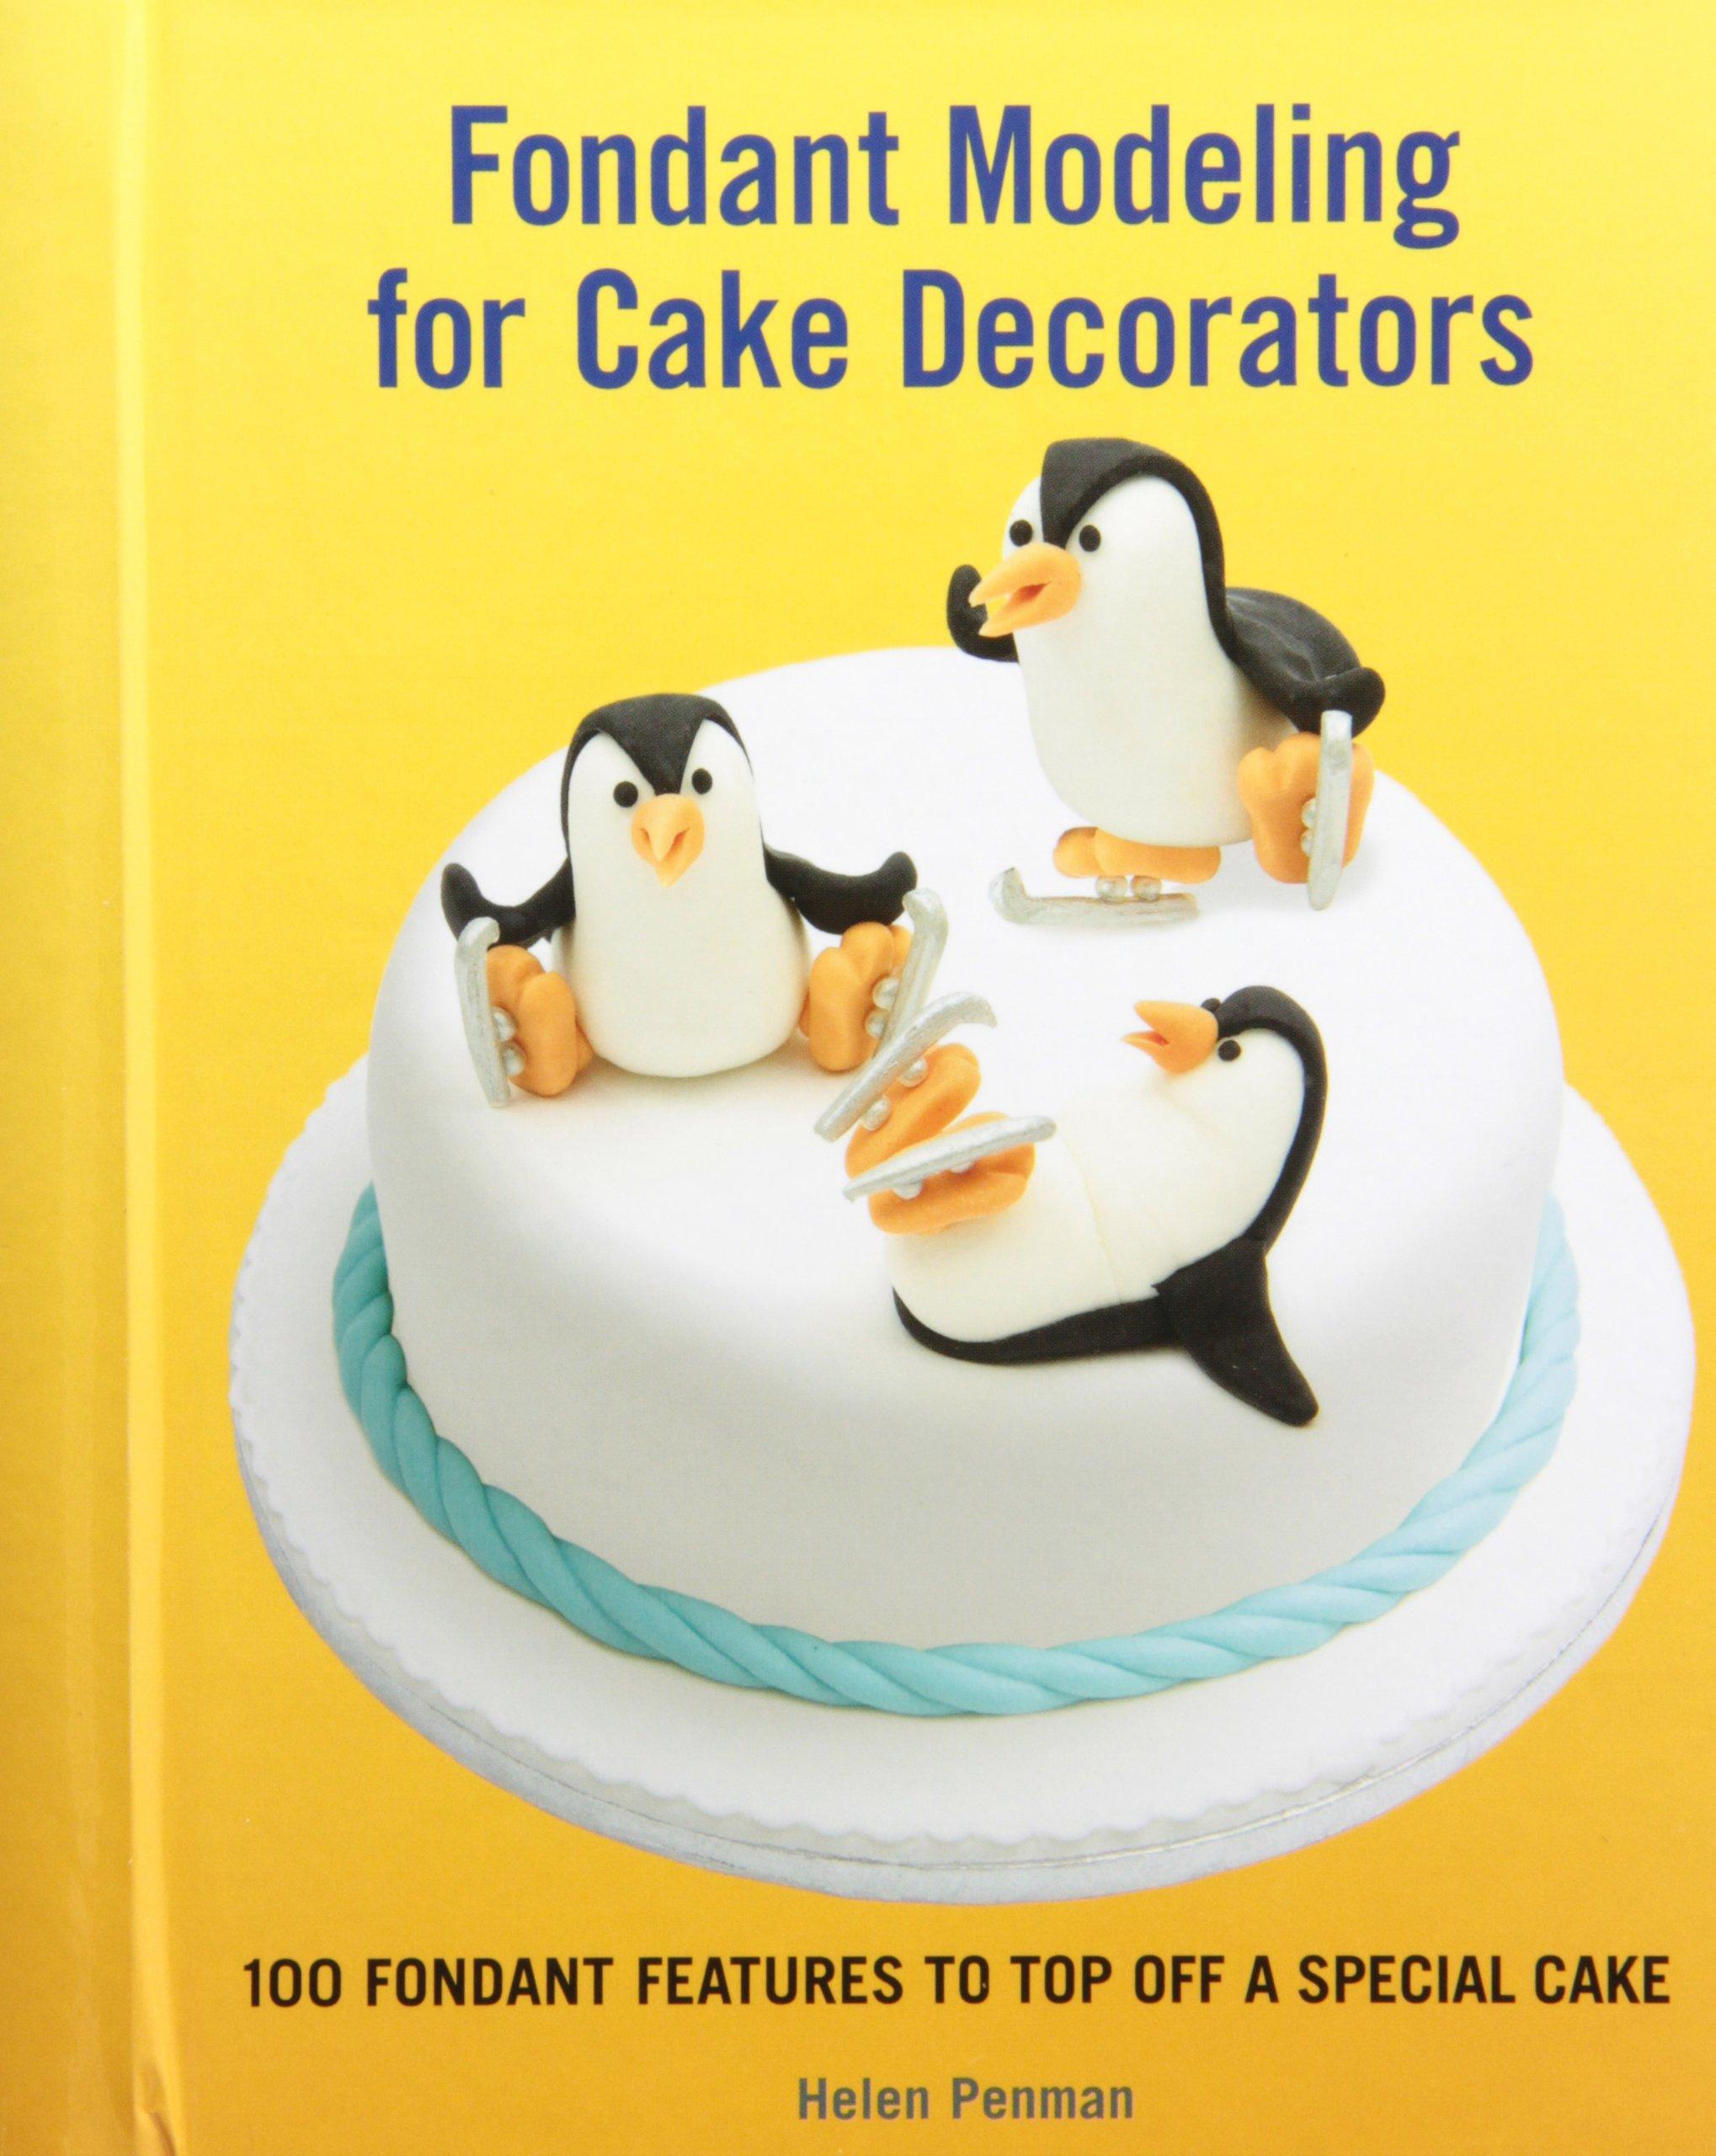 Fondant Modeling for Cake Decorators: 100 Fondant Features to Top ...